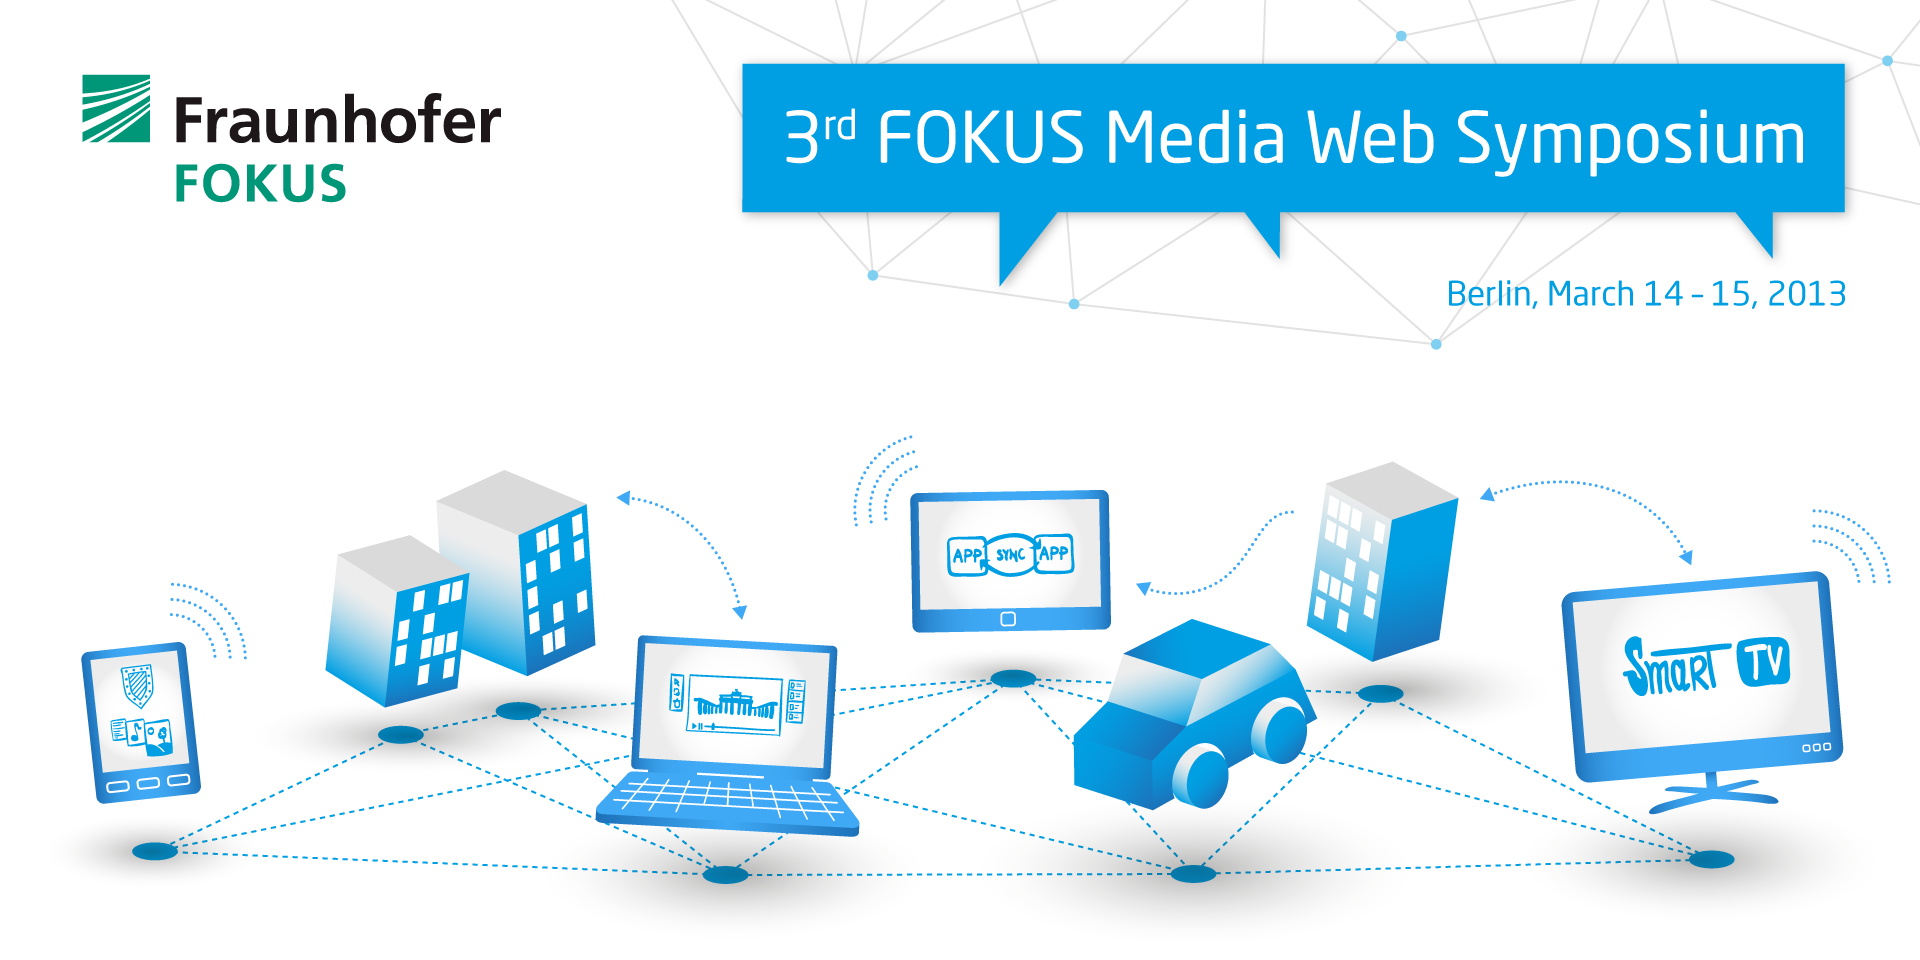 3rd FOKUS Medai Web Symposium